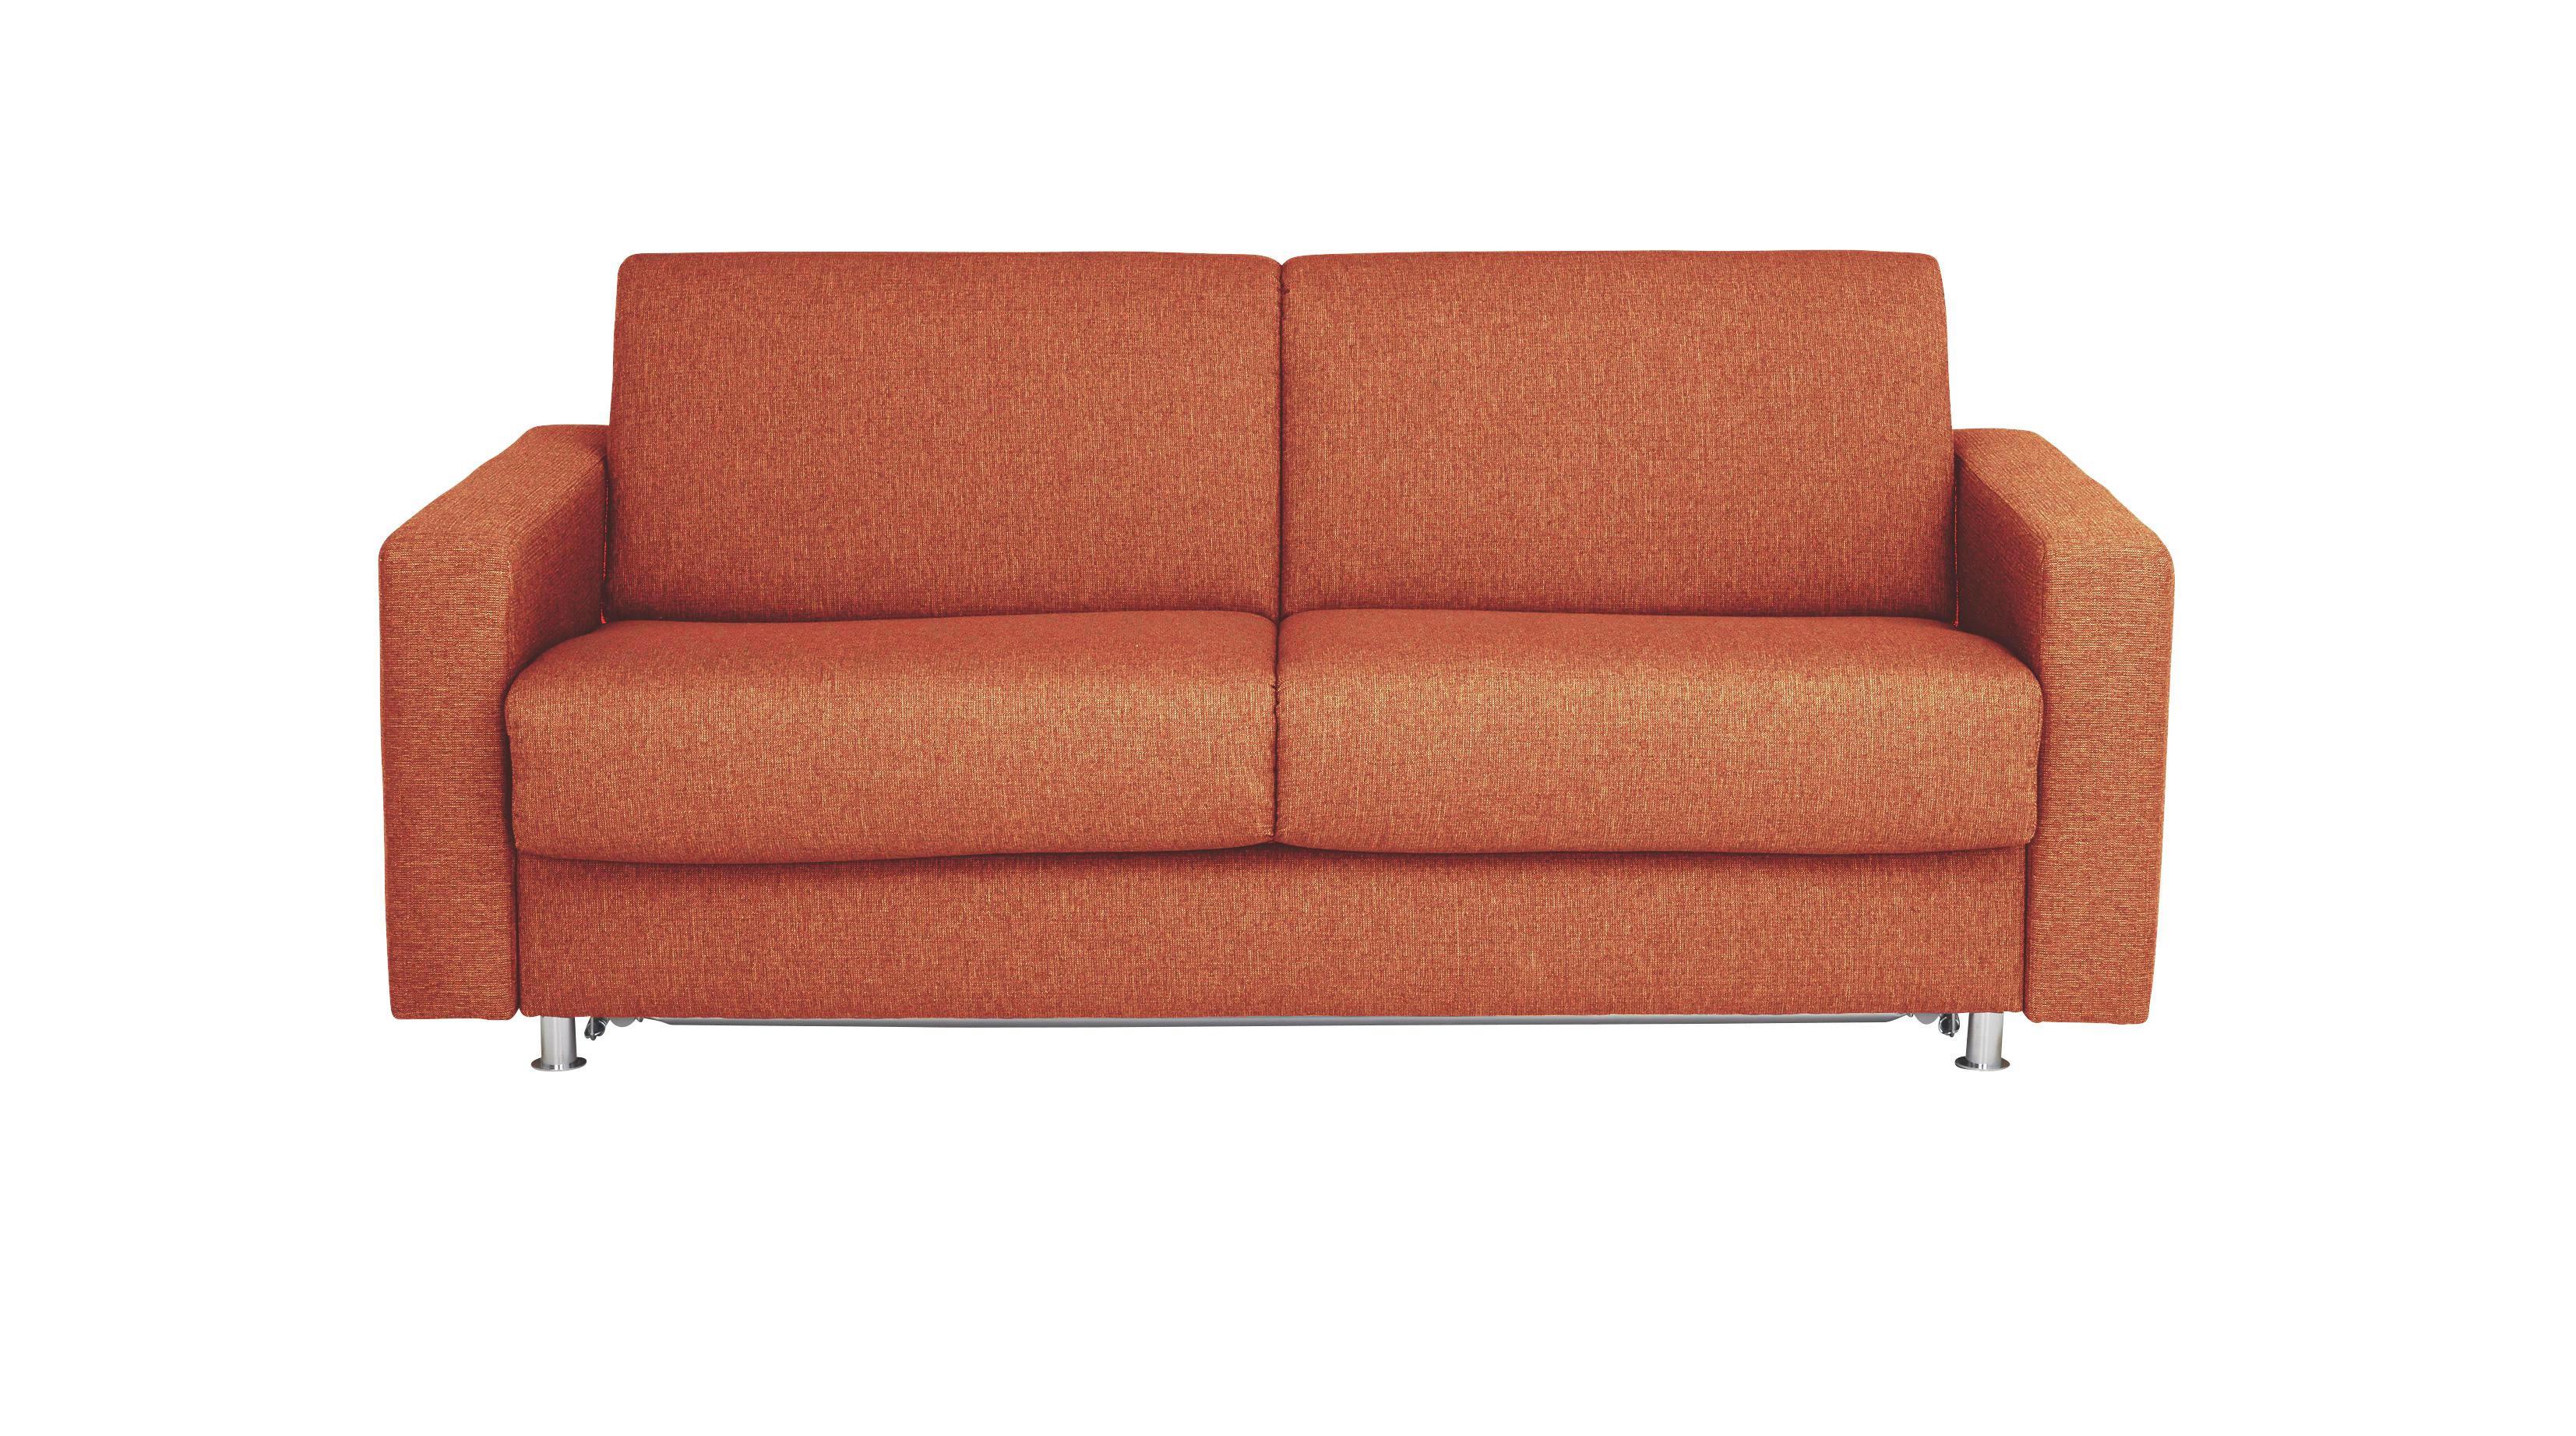 SCHLAFSOFA Flachgewebe Rot - Chromfarben/Rot, KONVENTIONELL, Textil/Metall (195/84/100cm)